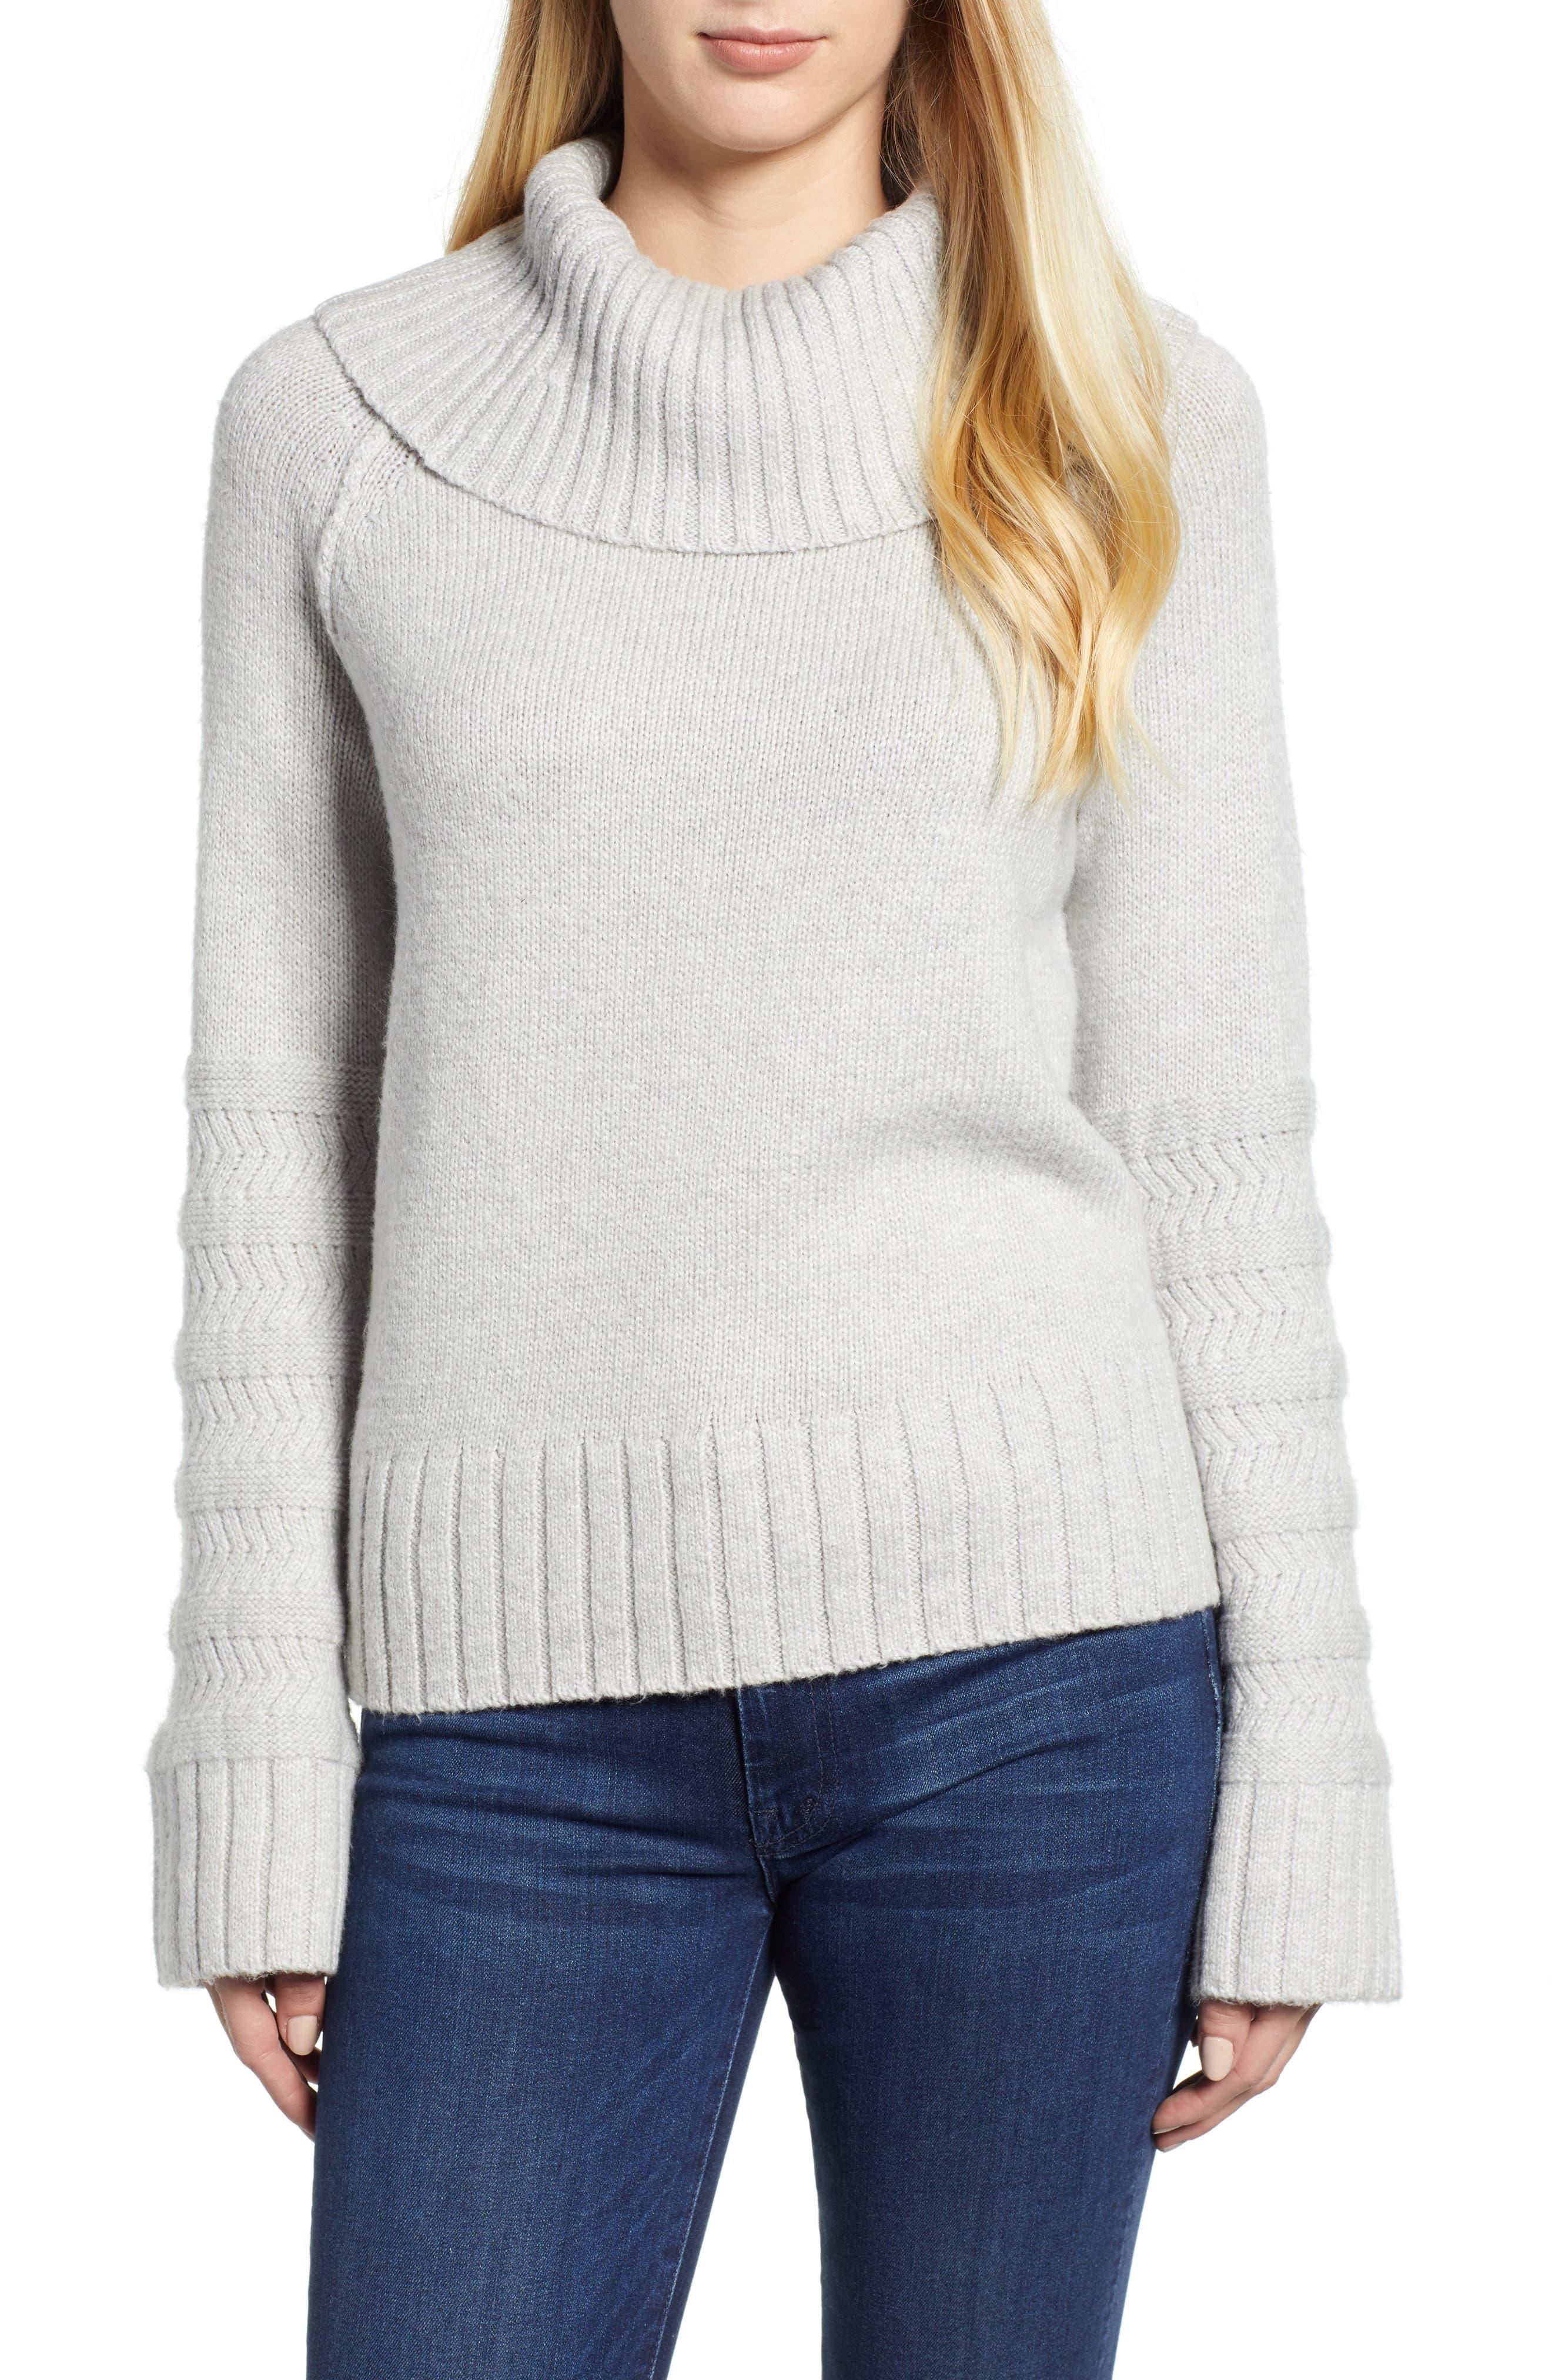 Turtleneck Sweater,                             Main thumbnail 1, color,                             GREY LIGHT HEATHER